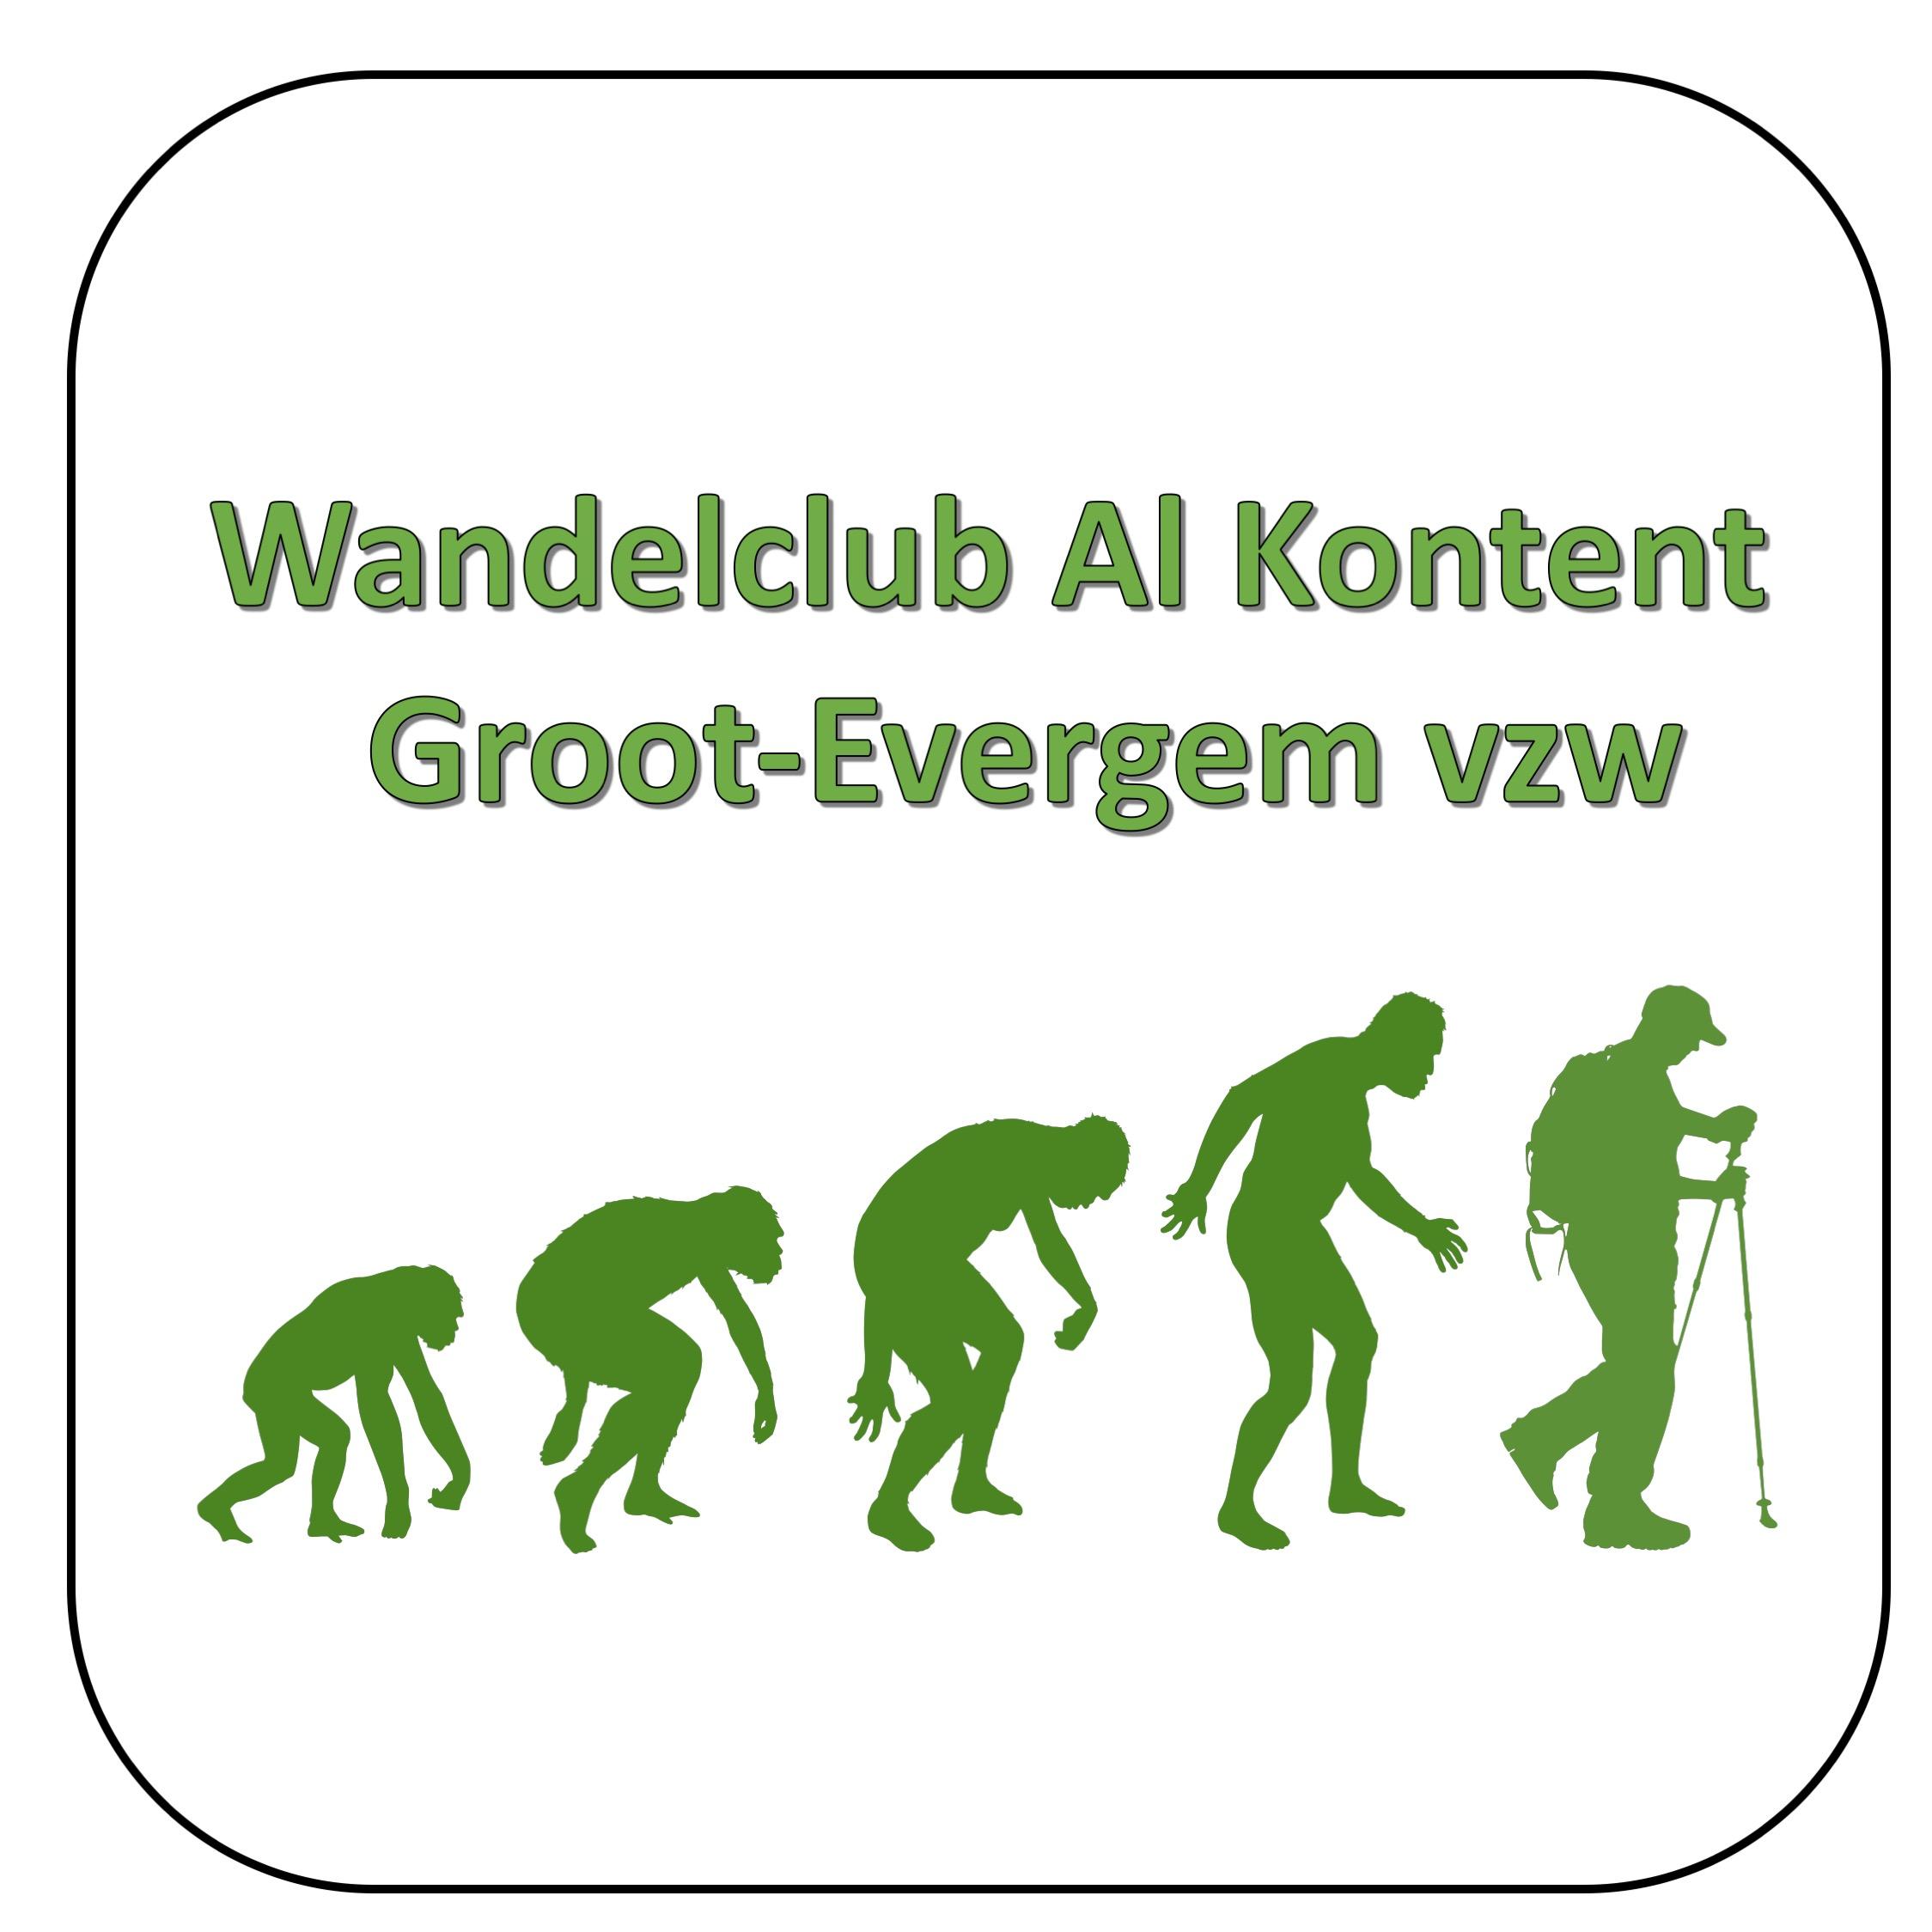 Wandelclub Al Kontent Groot Evergem vzw